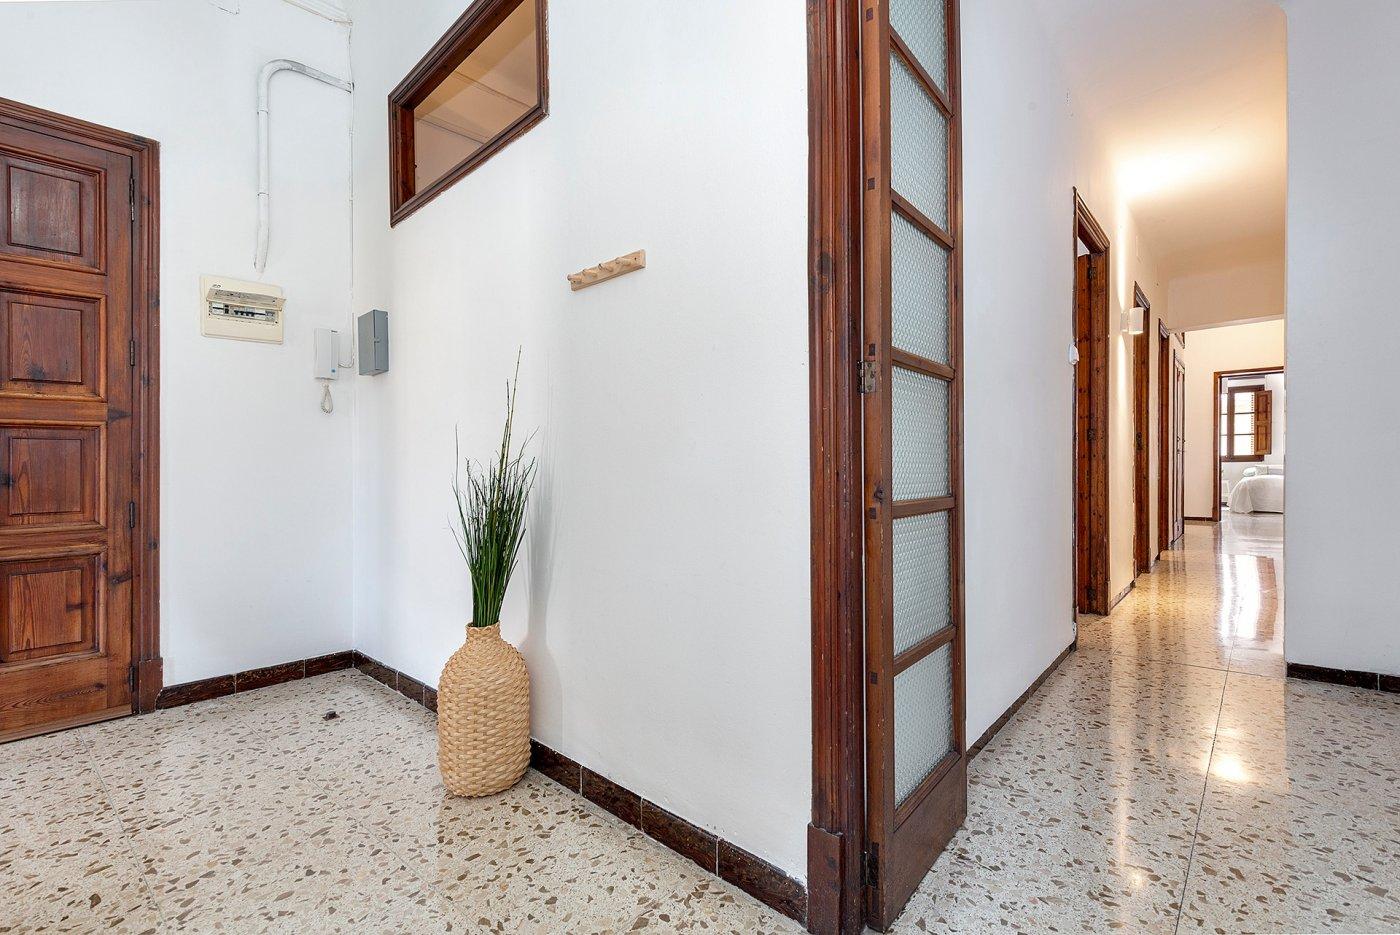 Centrico piso en venta. porta sant antoni. palma mallorca. - imagenInmueble19